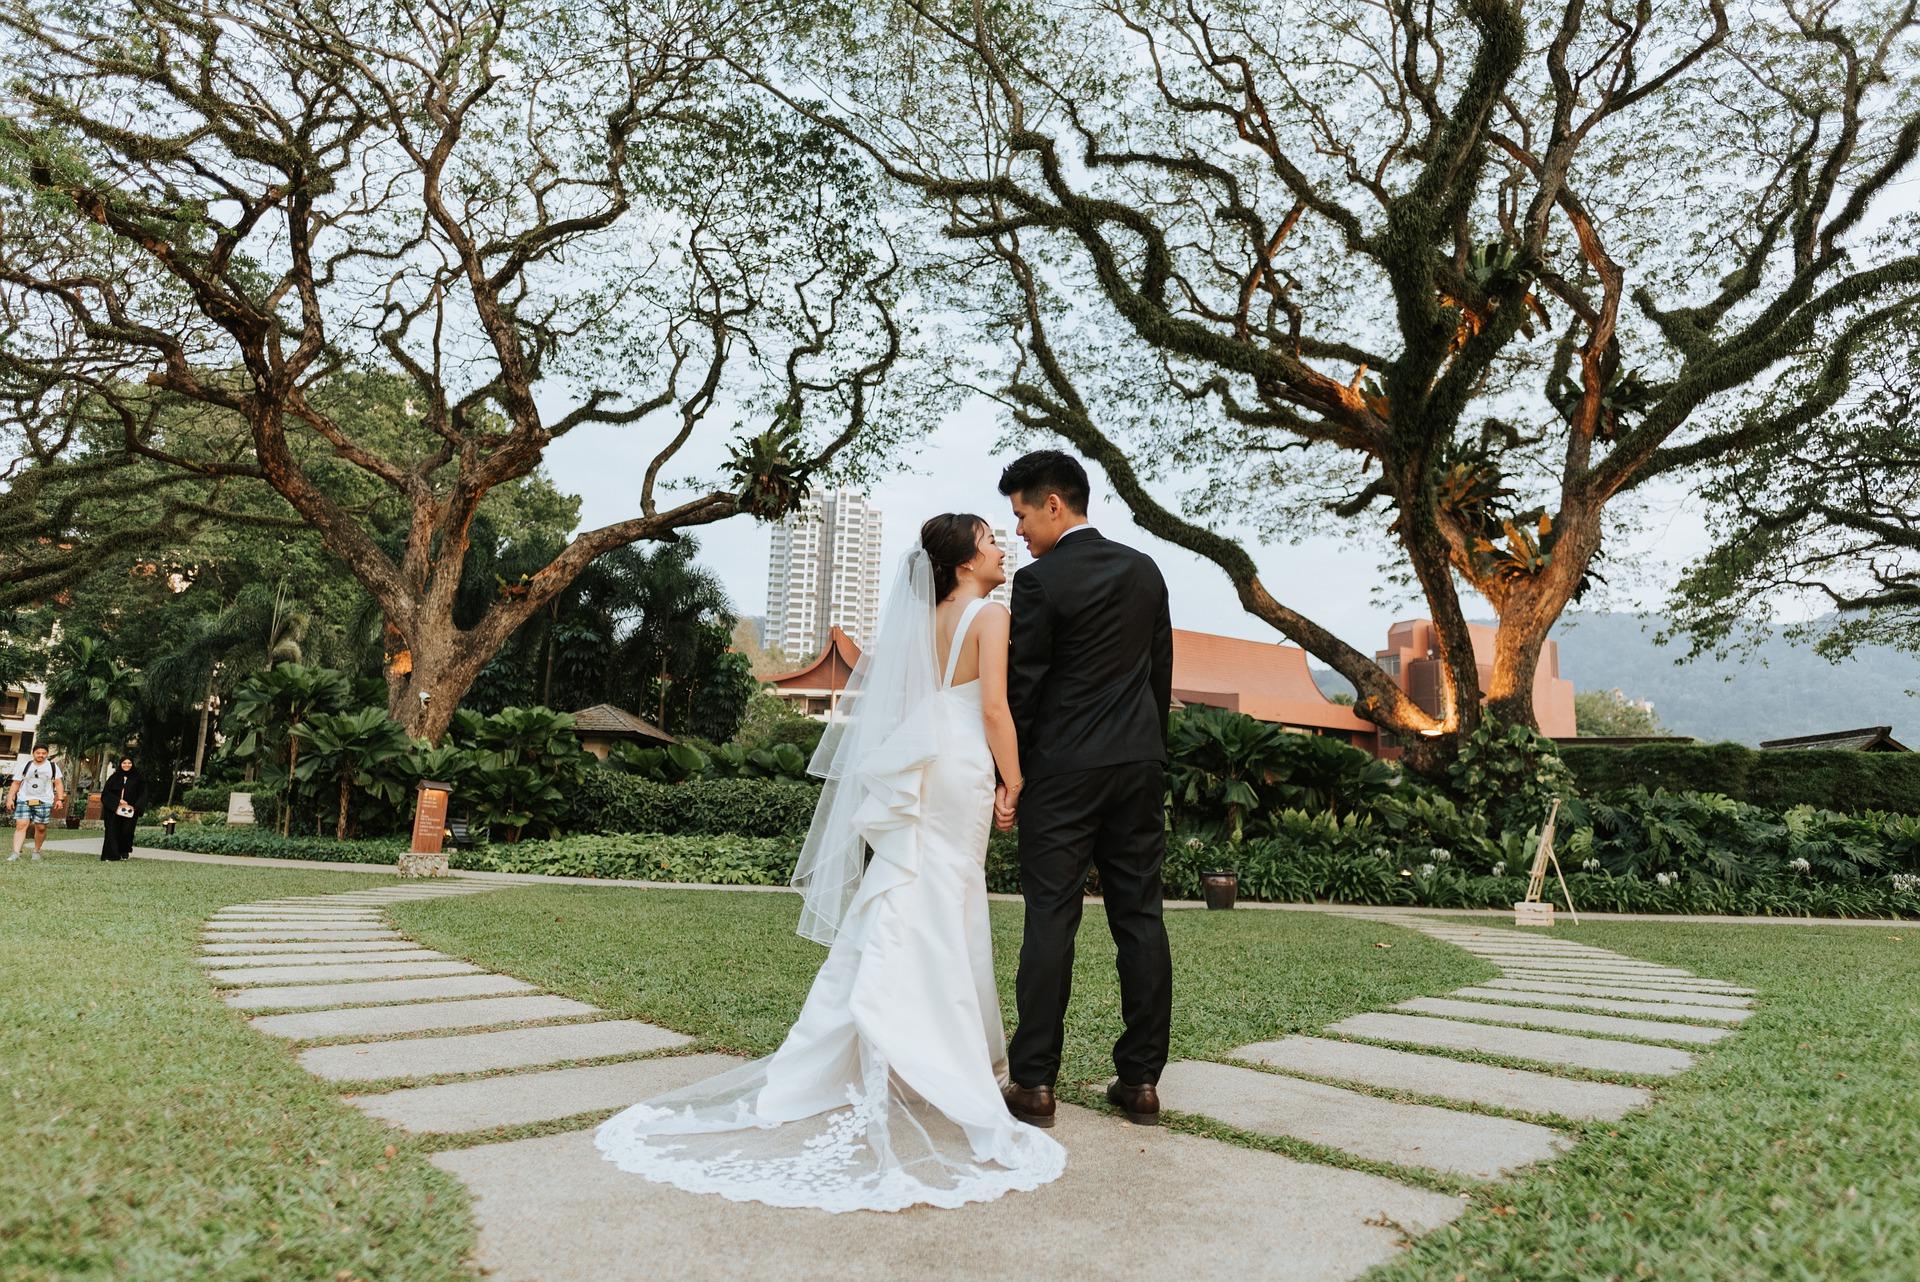 wedding-5156642_1920